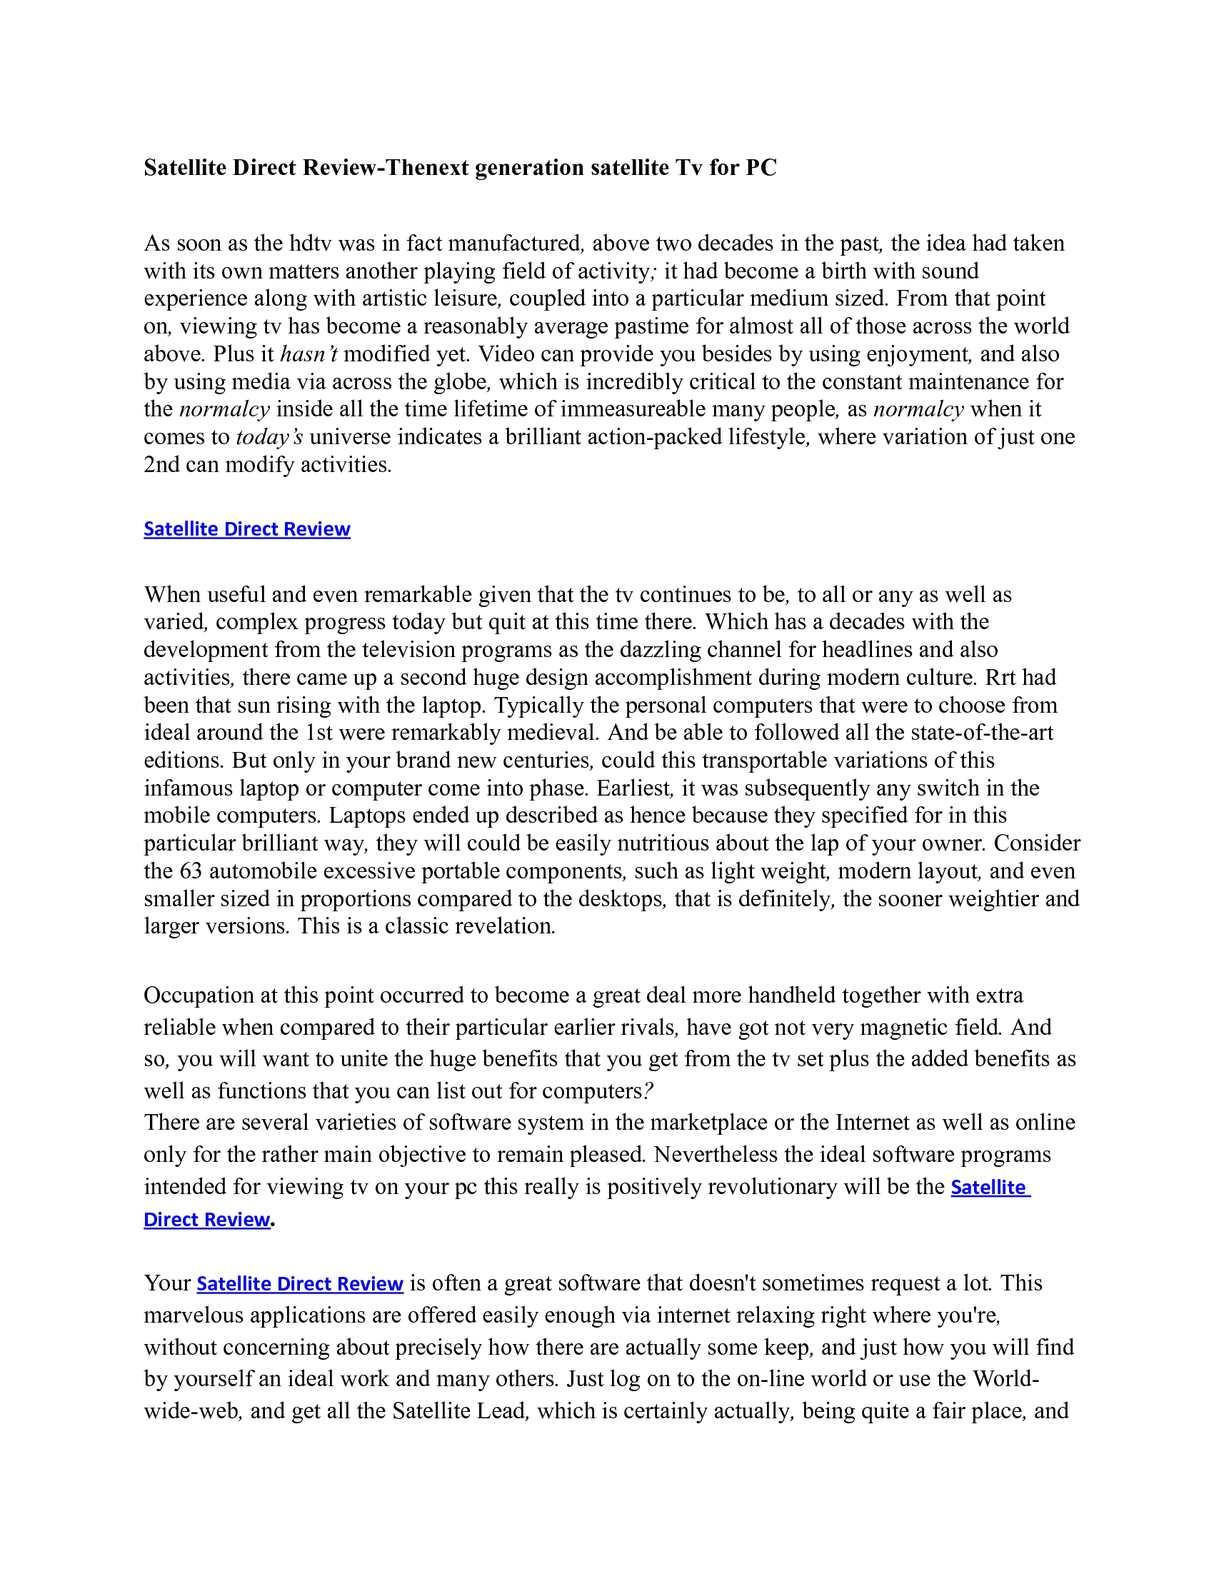 Calaméo - Satellite Direct Review-Thenext generation